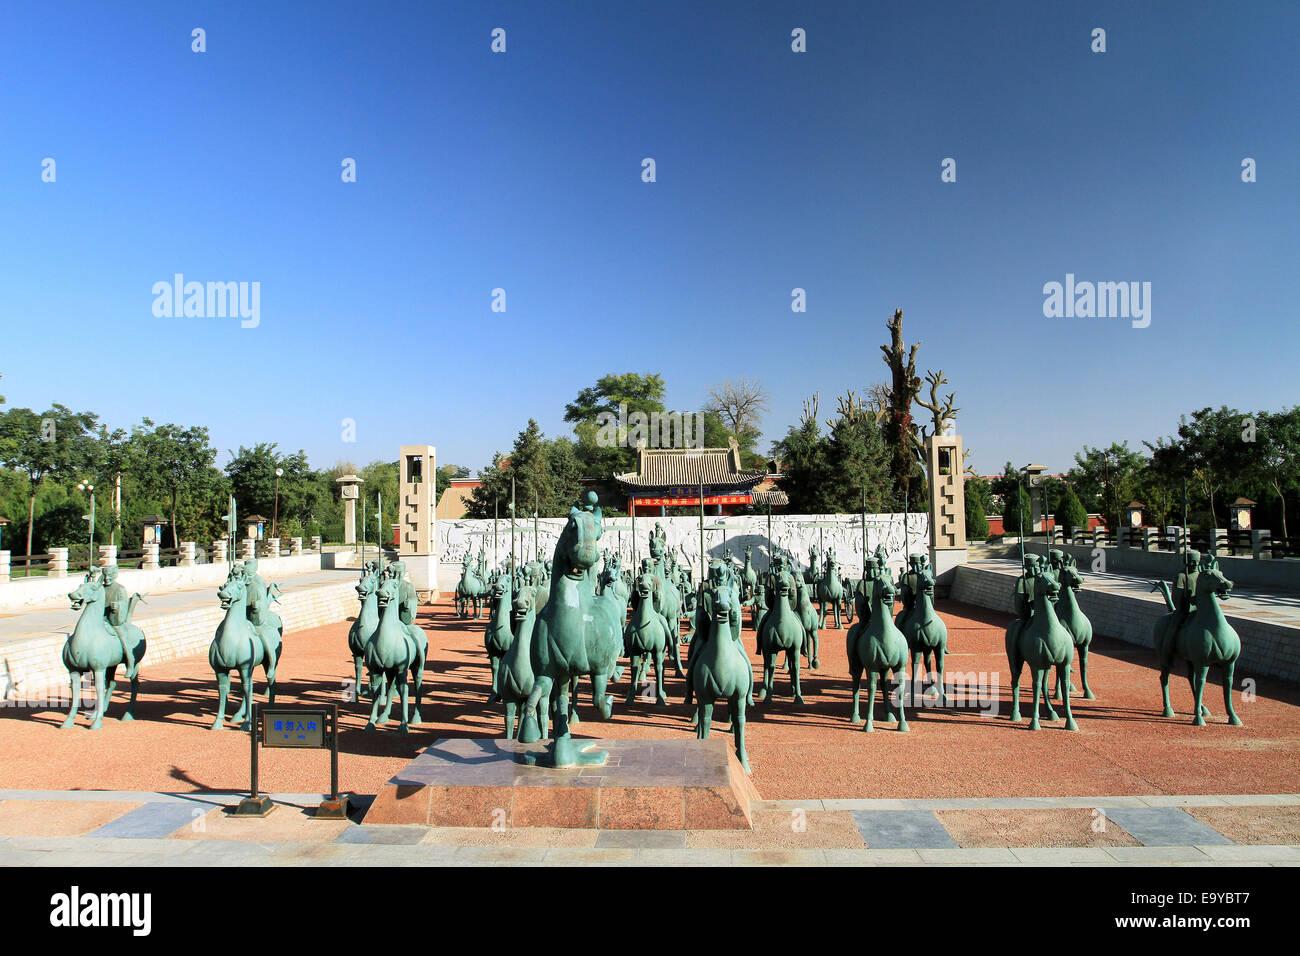 Wuwei City , Gansu Tong Juma team sculpture - Stock Image